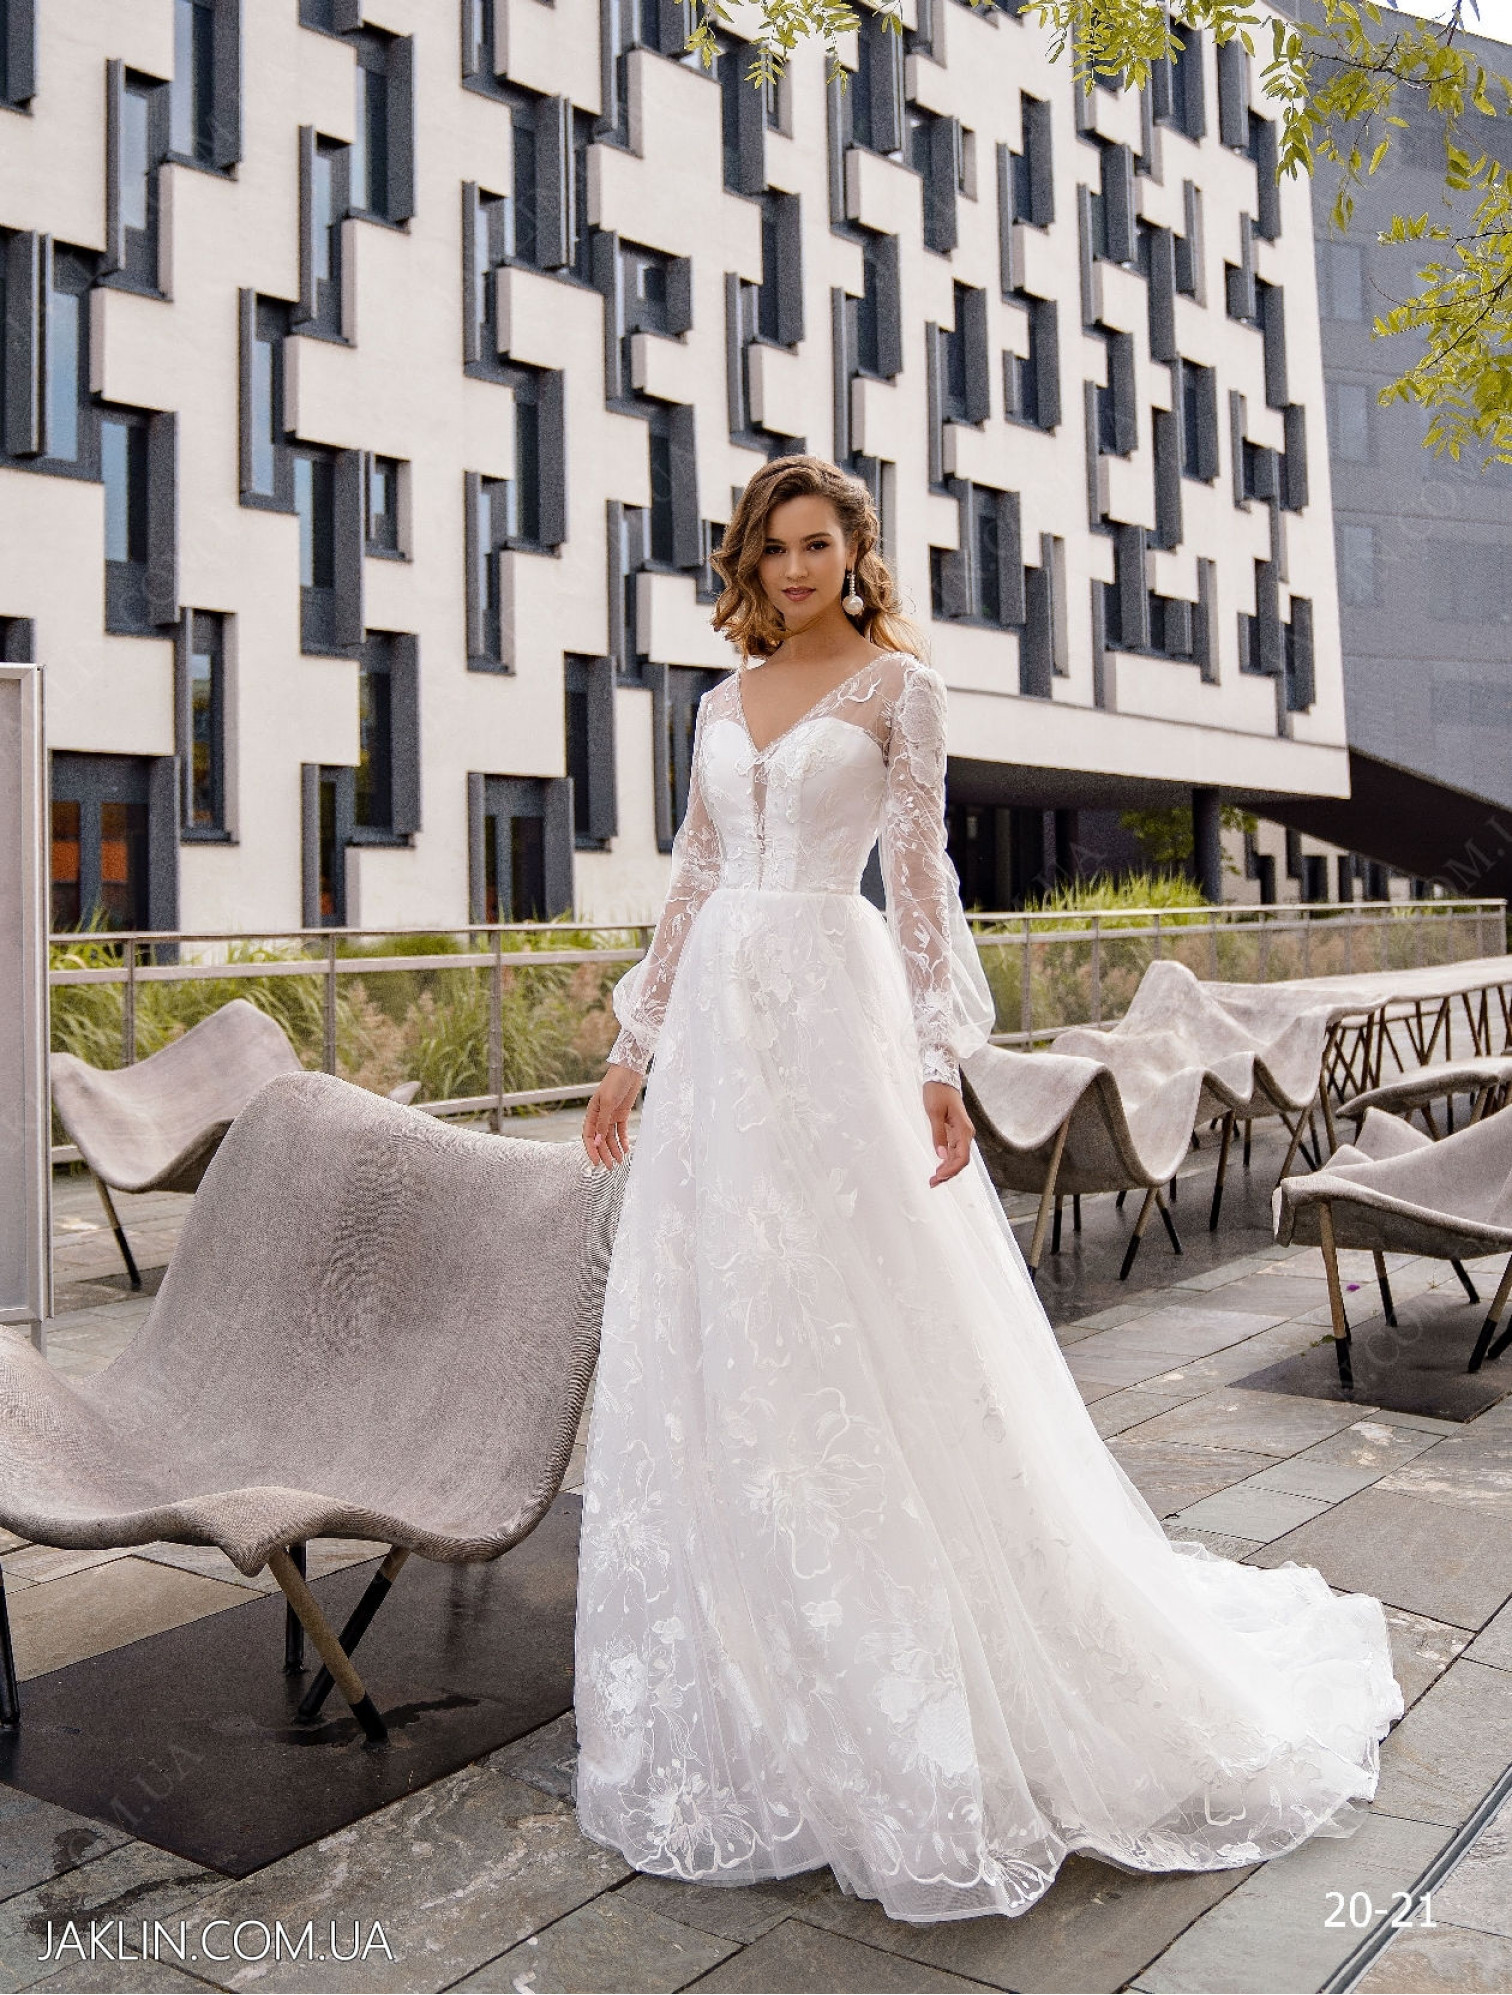 Wedding dress 20-21